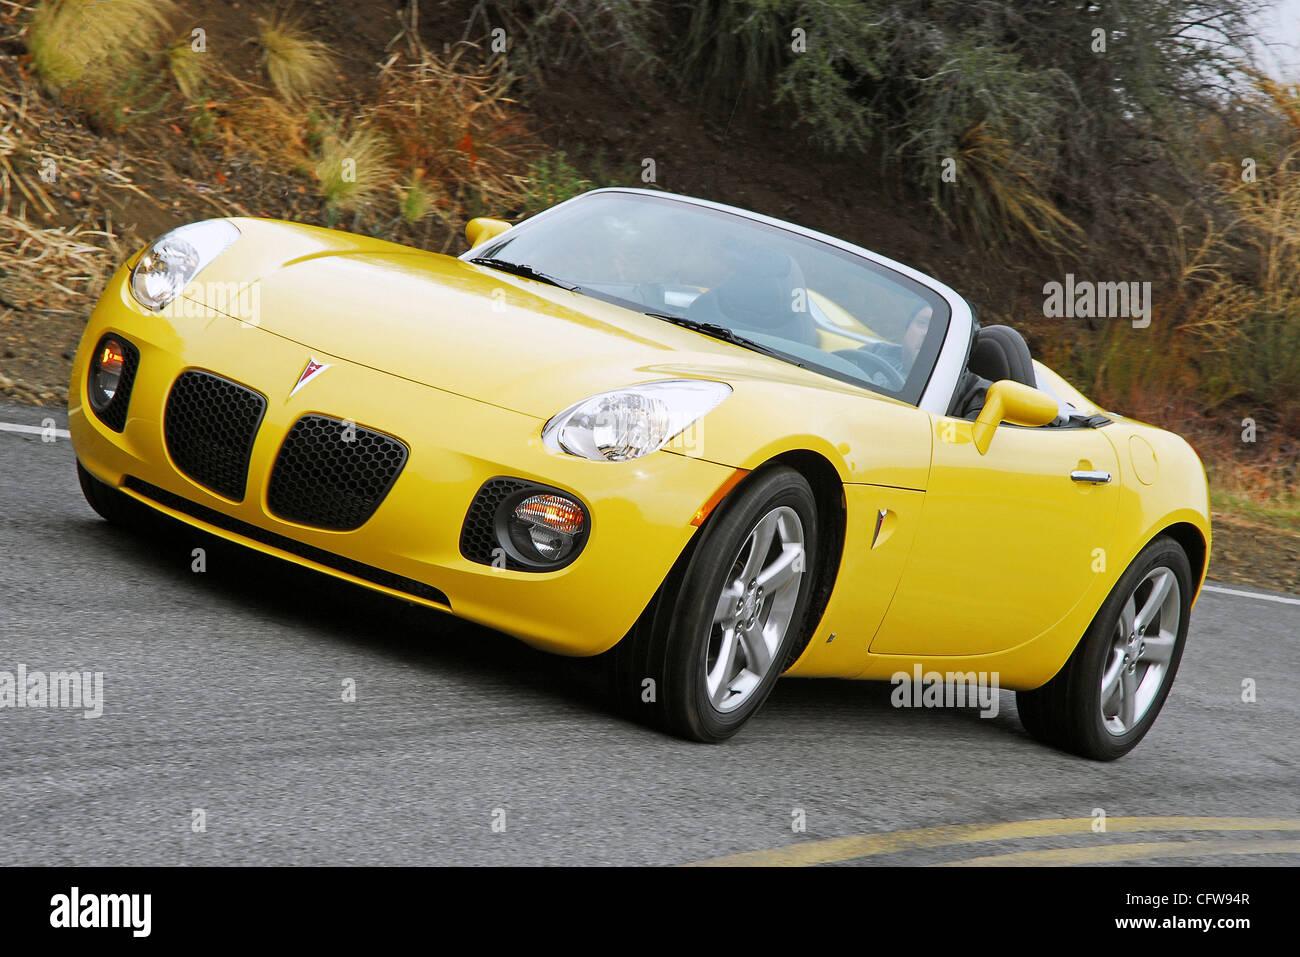 Headon Action 2007 Pontiac Solstice GXP   Stock Image